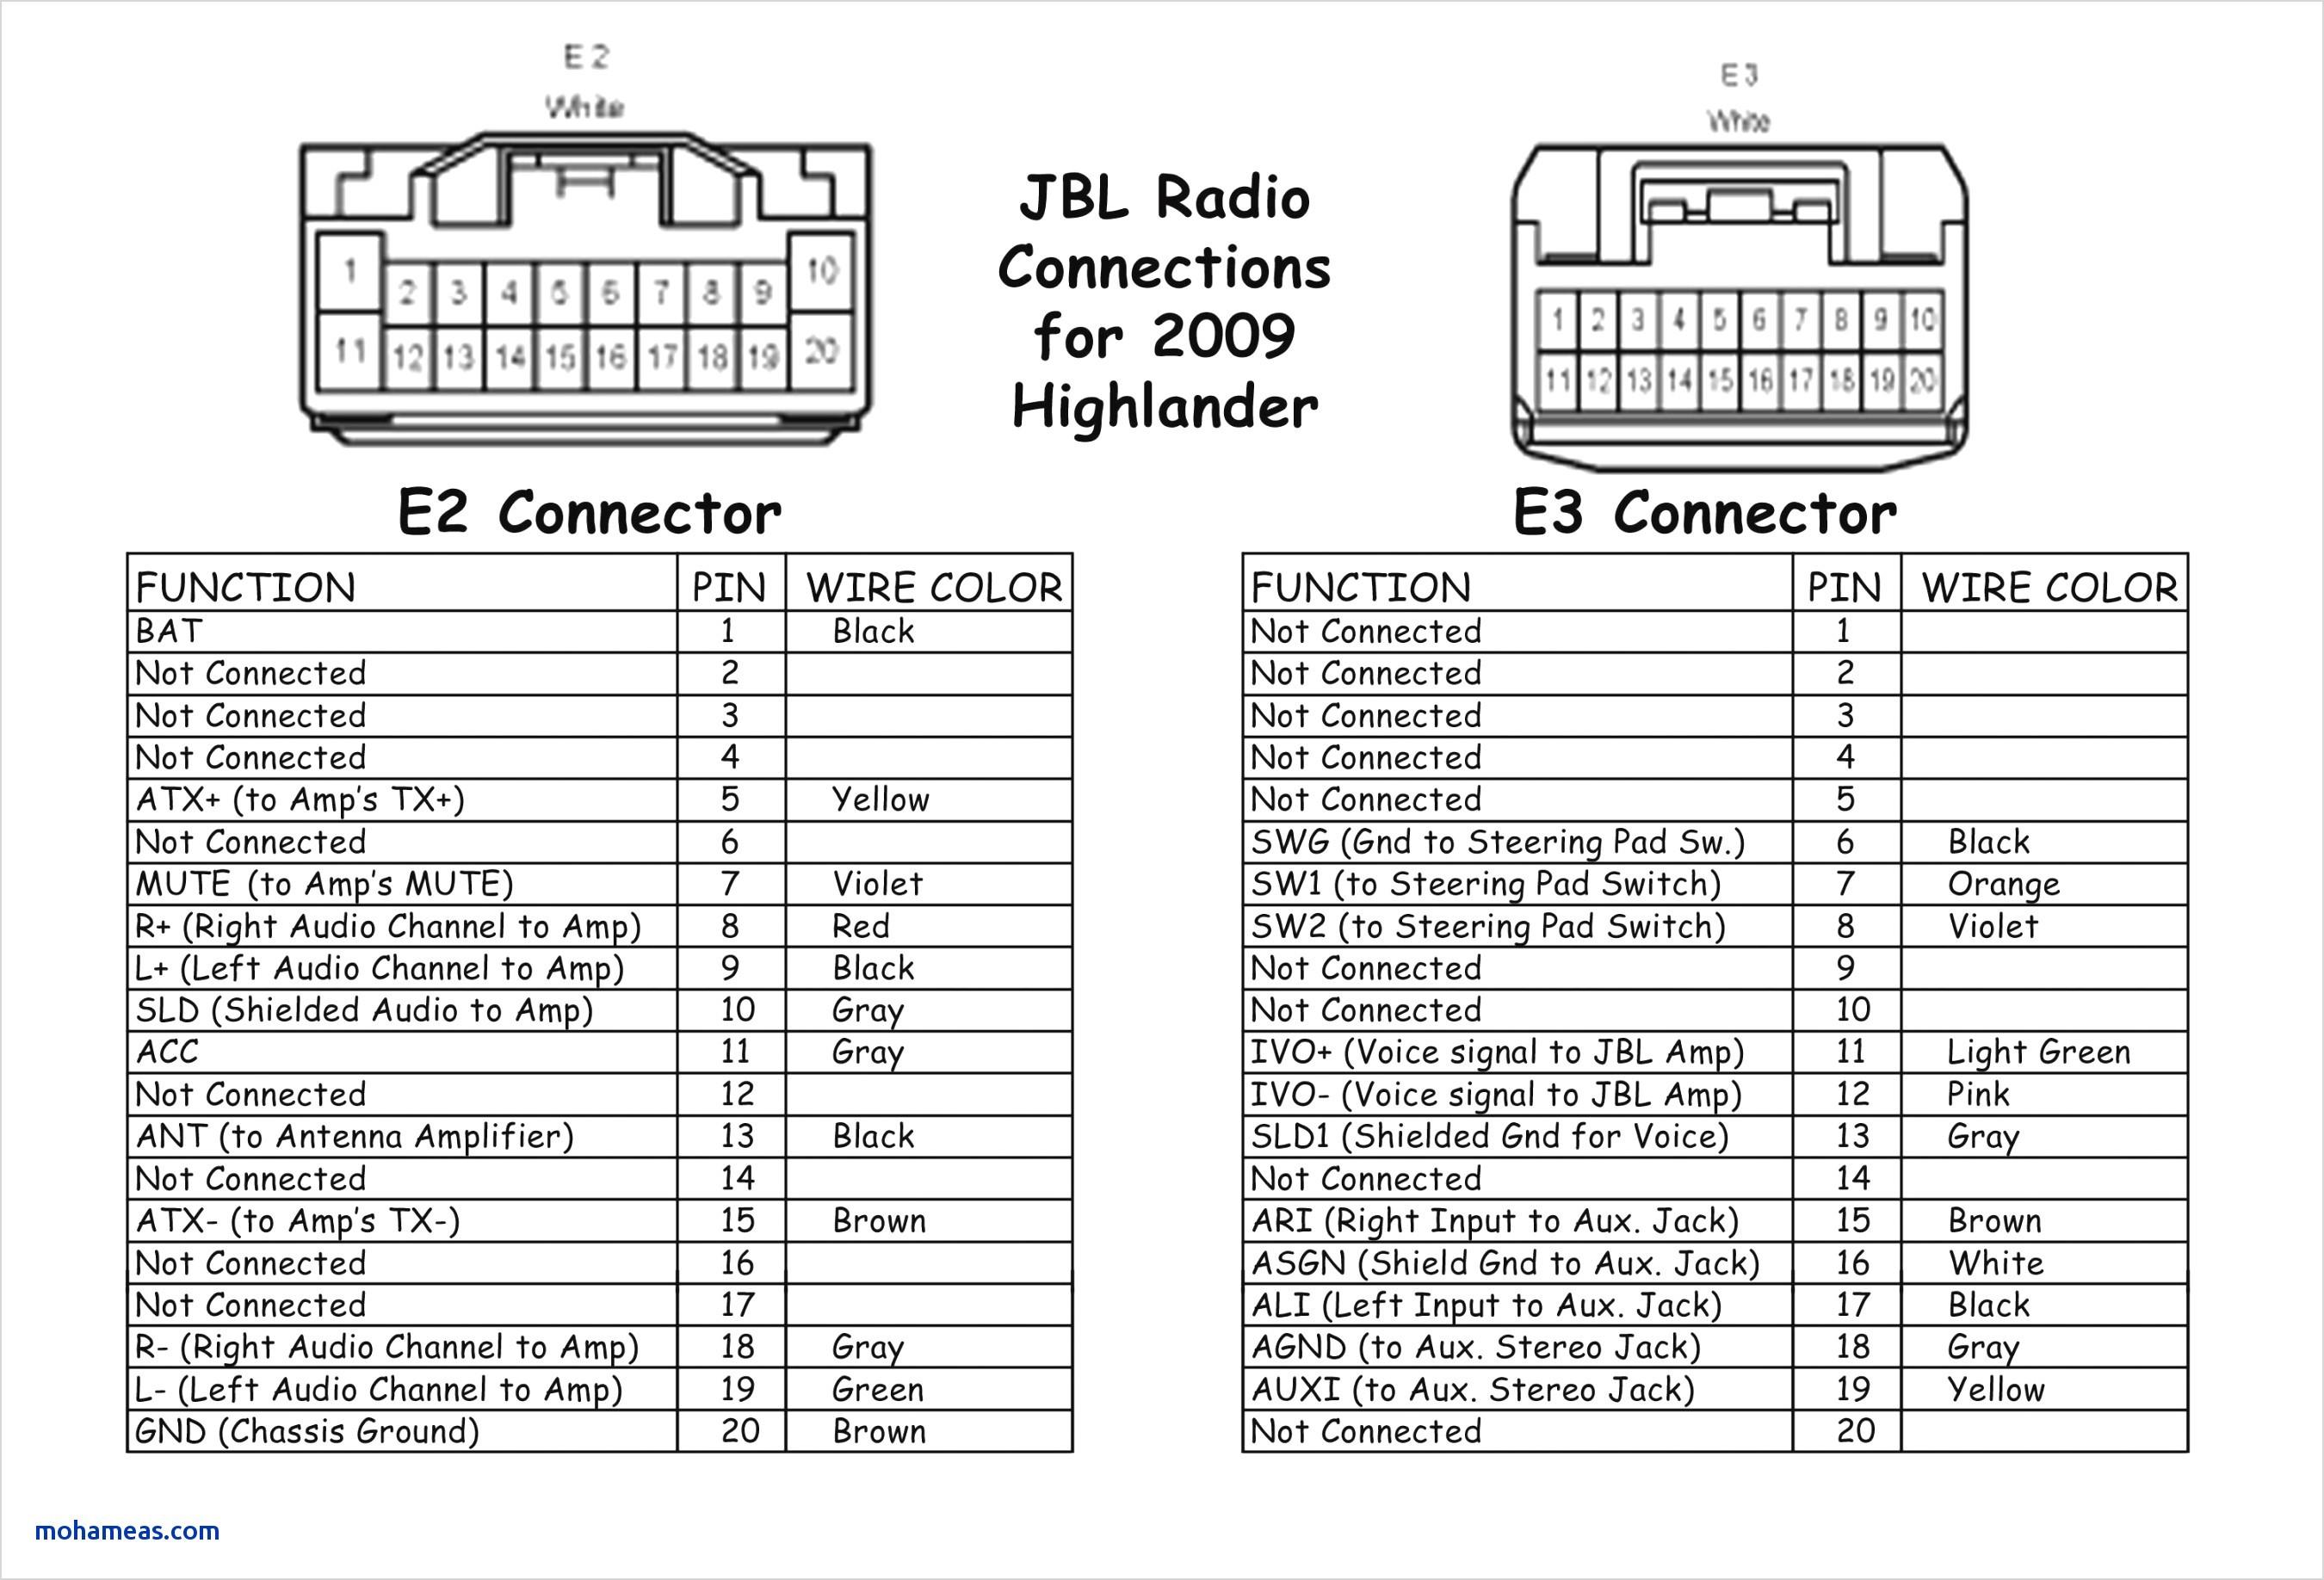 2013 subaru wrx radio wiring diagram kz 6326  forester radio wiring diagram on clarion car stereo  radio wiring diagram on clarion